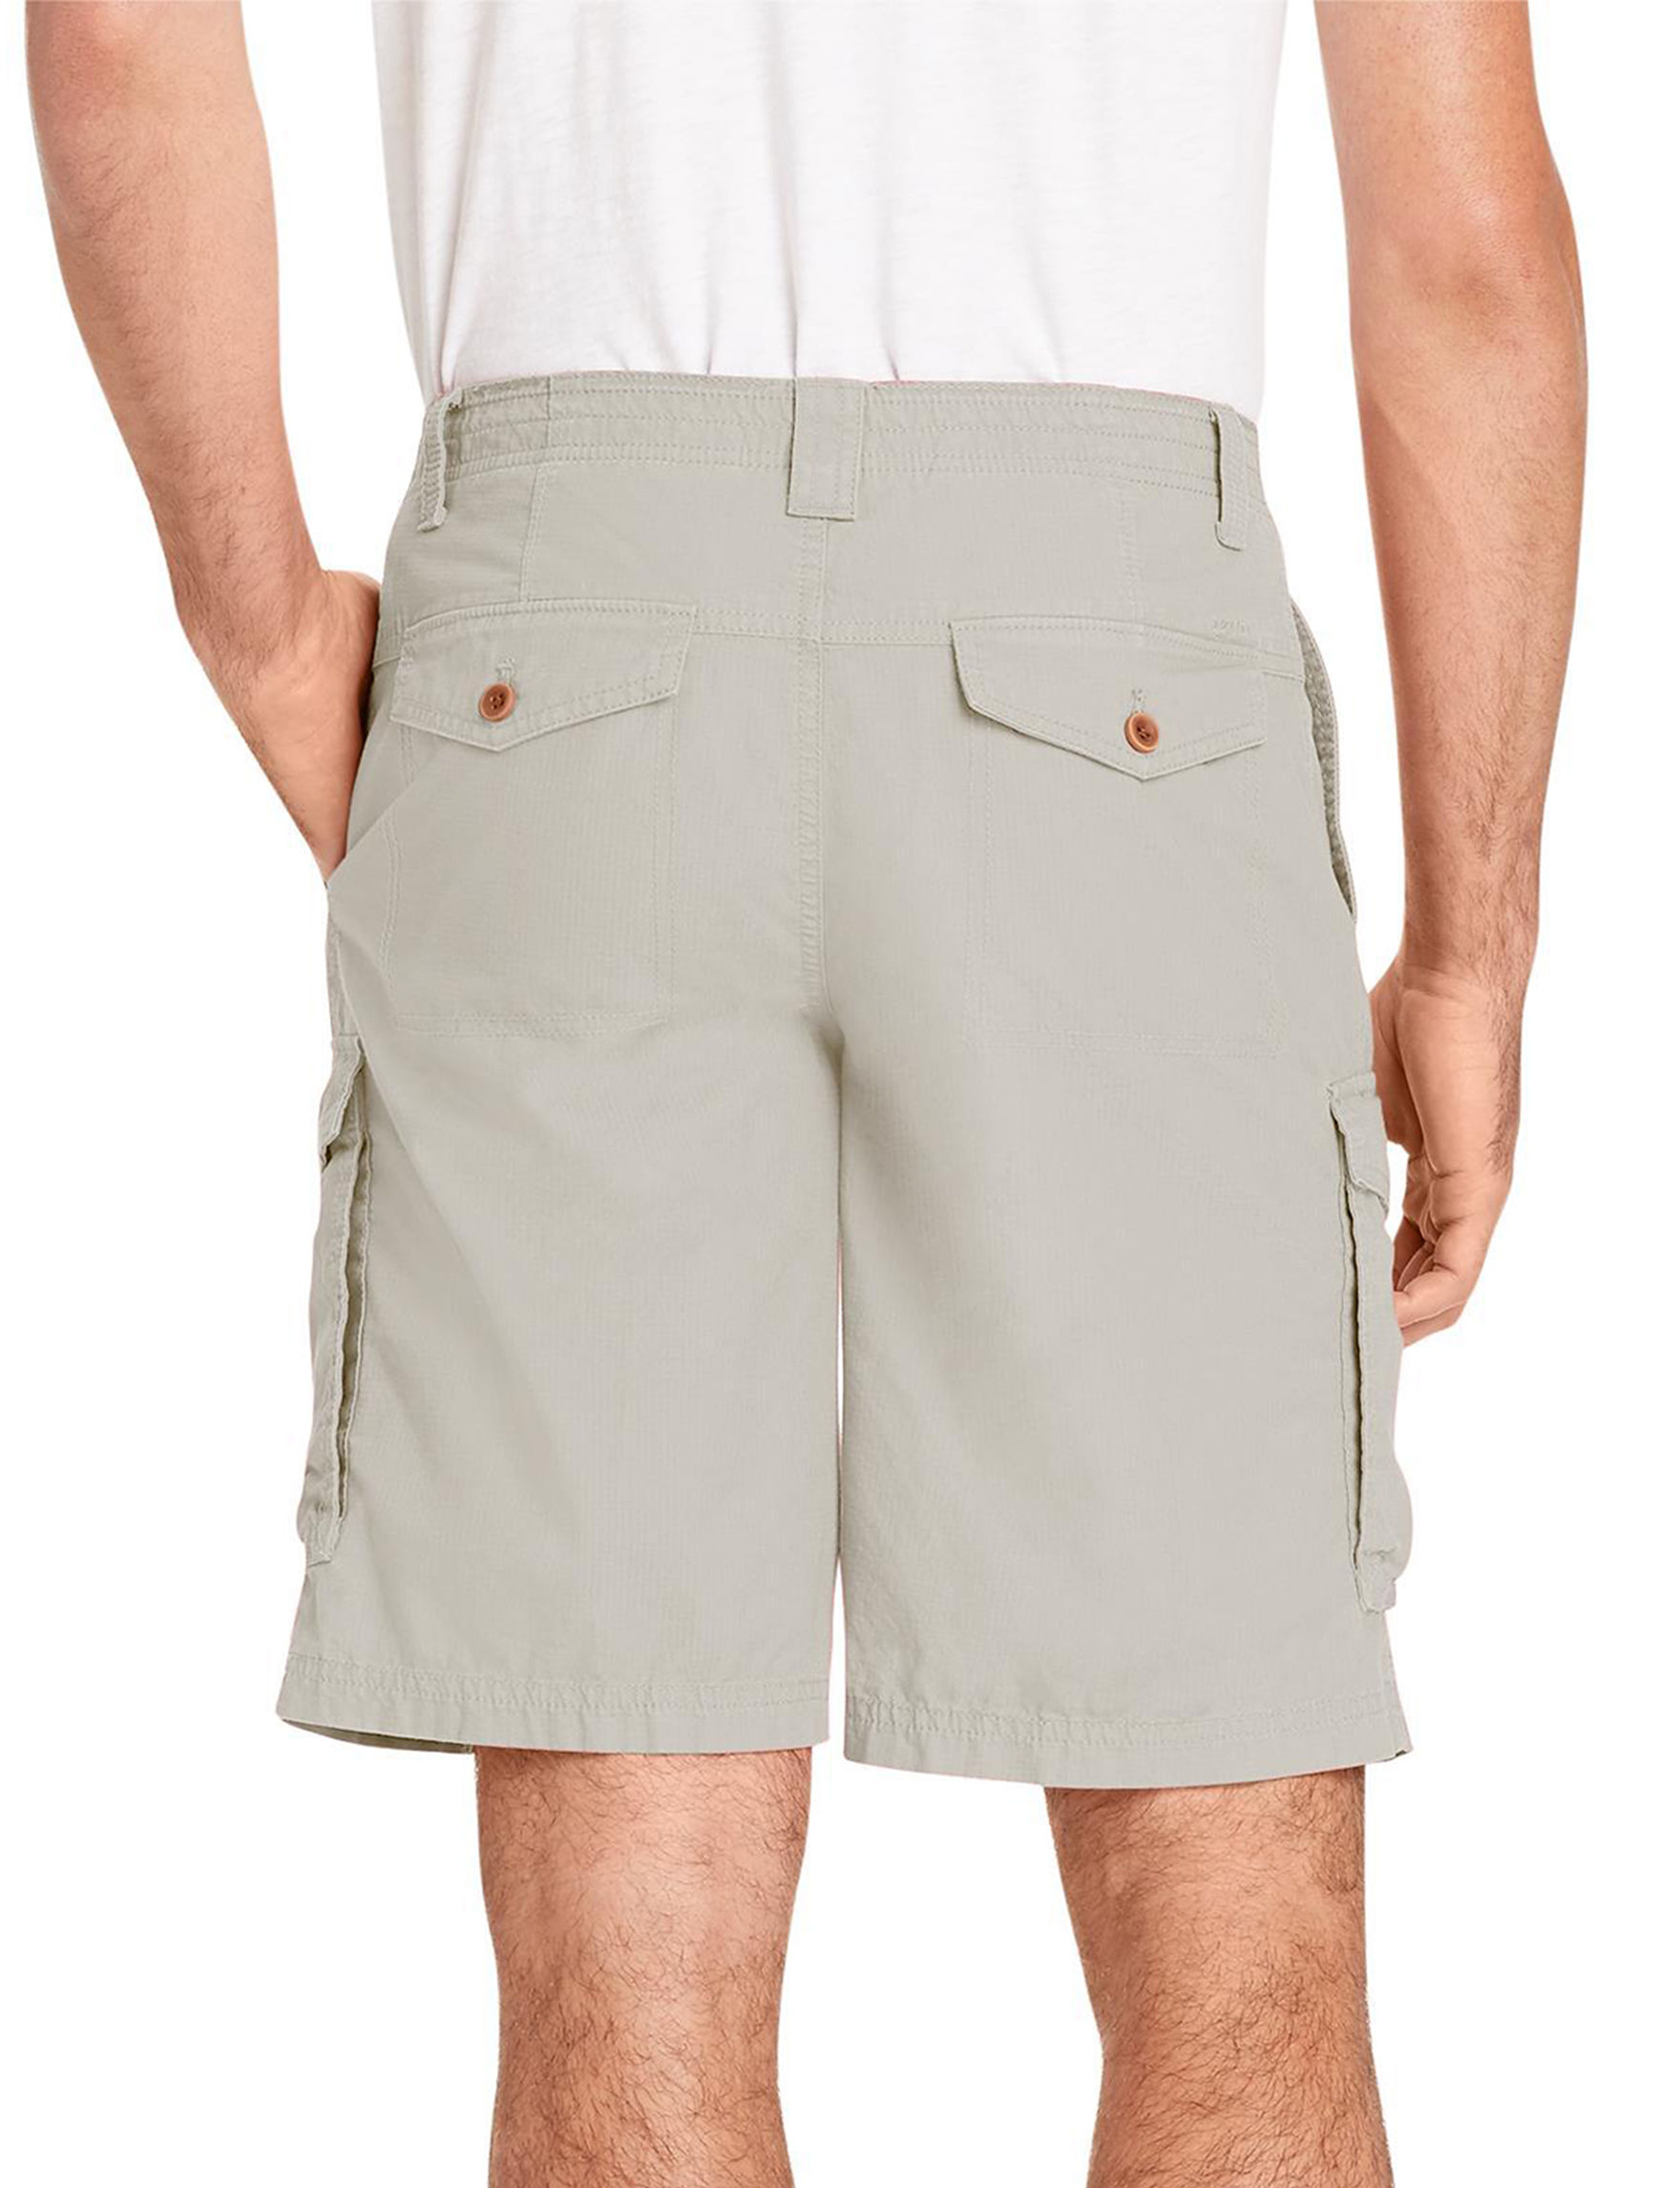 ecc4830174 Izod Men's Ripstop Cargo Shorts | Stage Stores